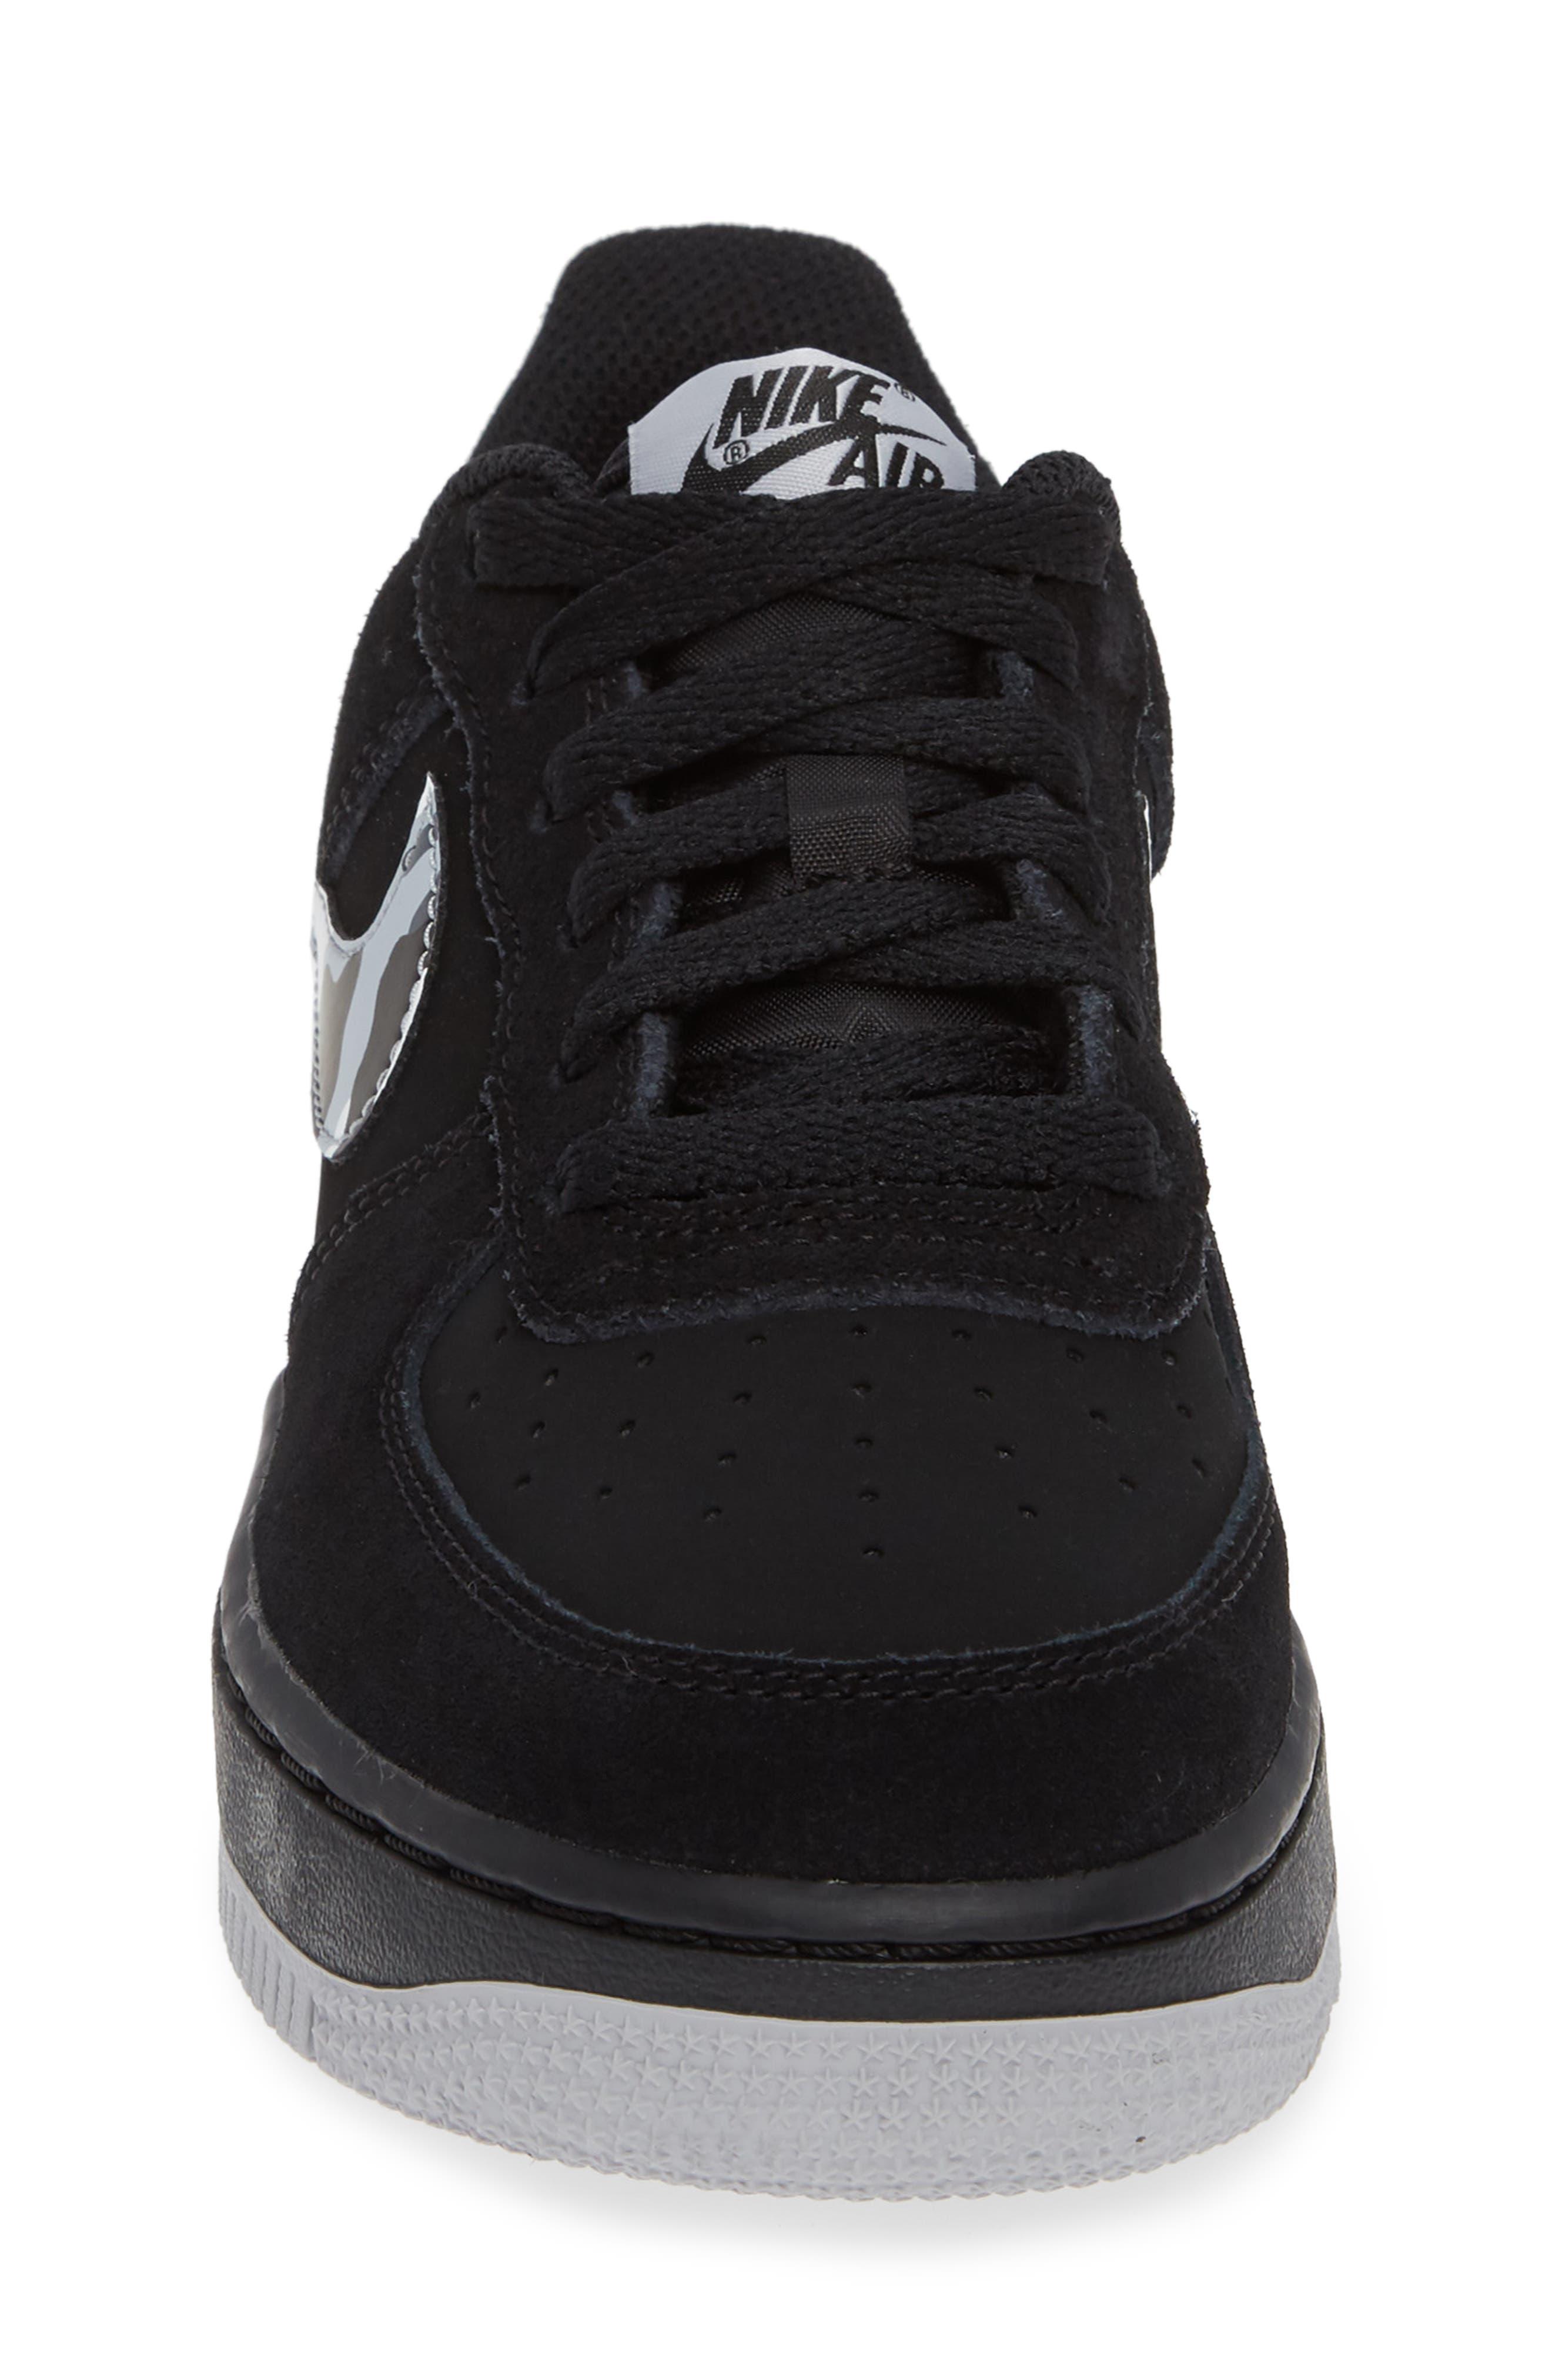 Air Force 1 Sneaker,                             Alternate thumbnail 4, color,                             BLACK/ GREY/ WHITE